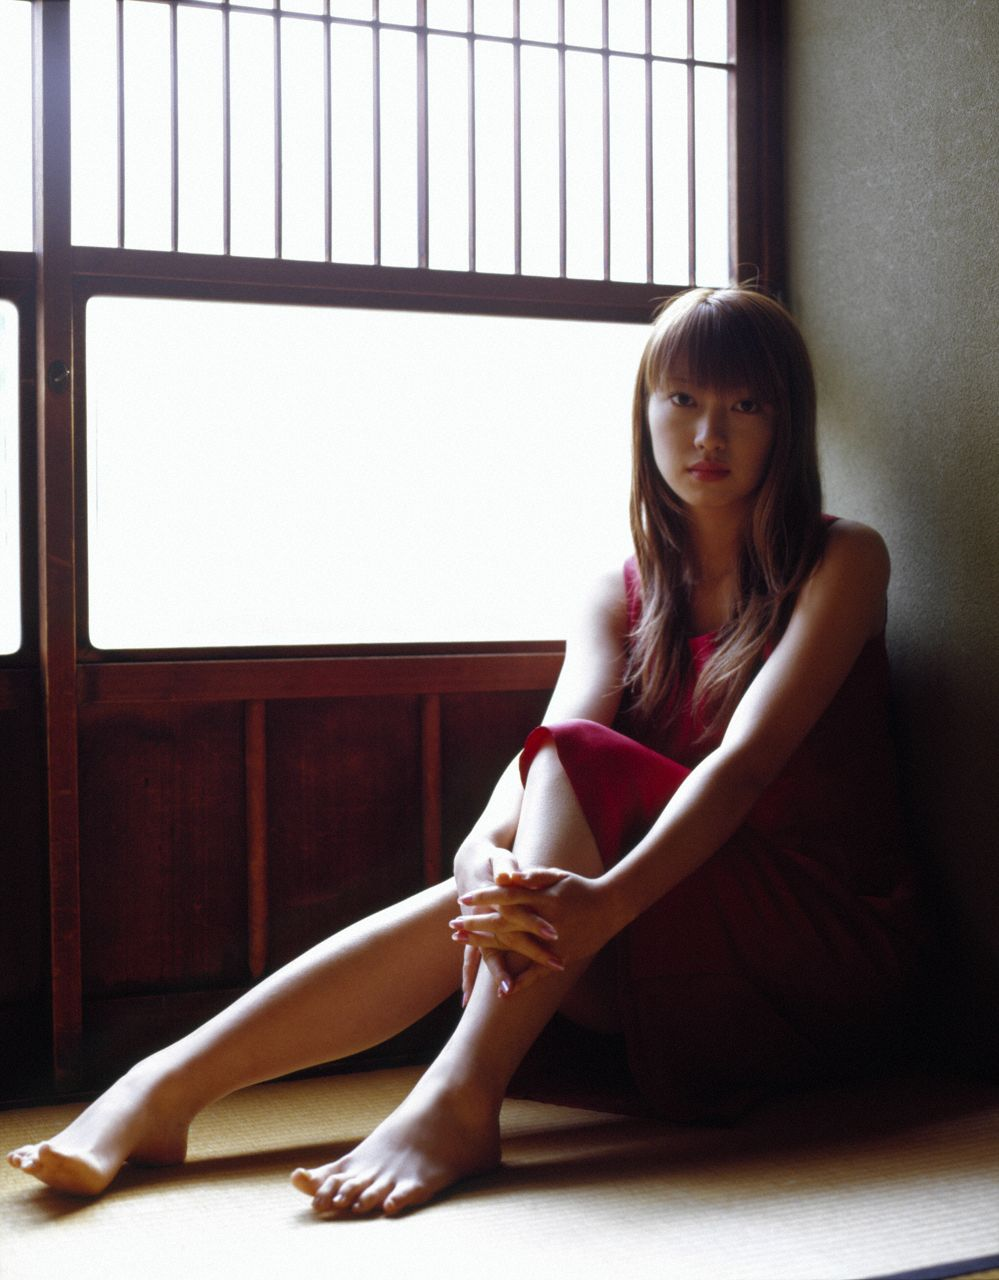 [Hello! Project Digital Books]No.27 Yuko Nakazawa 中澤裕子 + Kaori Iida 飯田圭織 + Natsumi Abe 安倍な[102P] Hello! Project 第3张